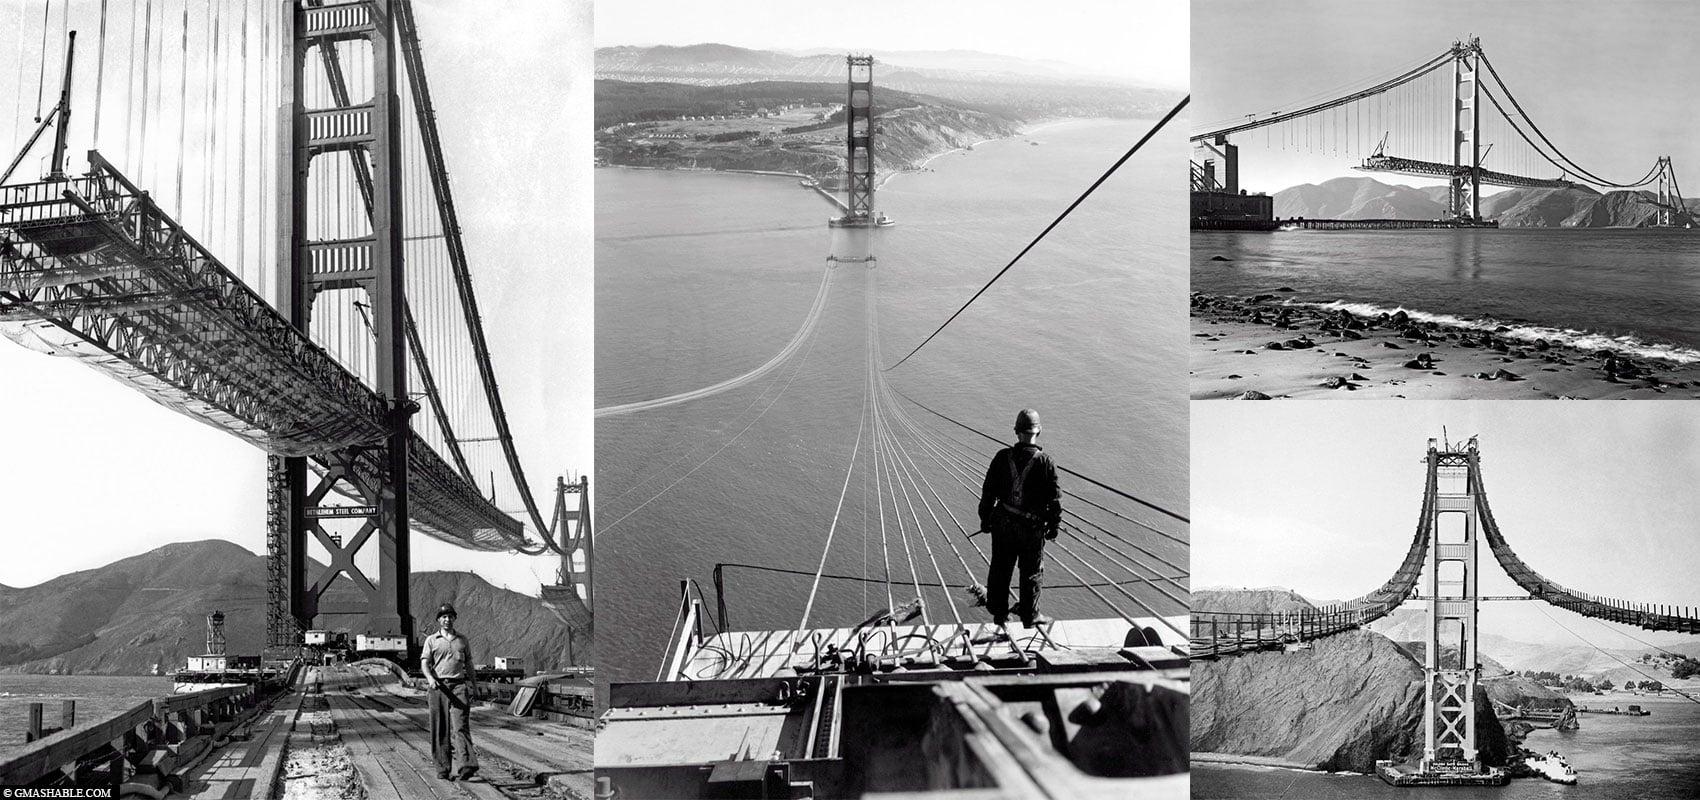 Construction, Golden Gate Bridge